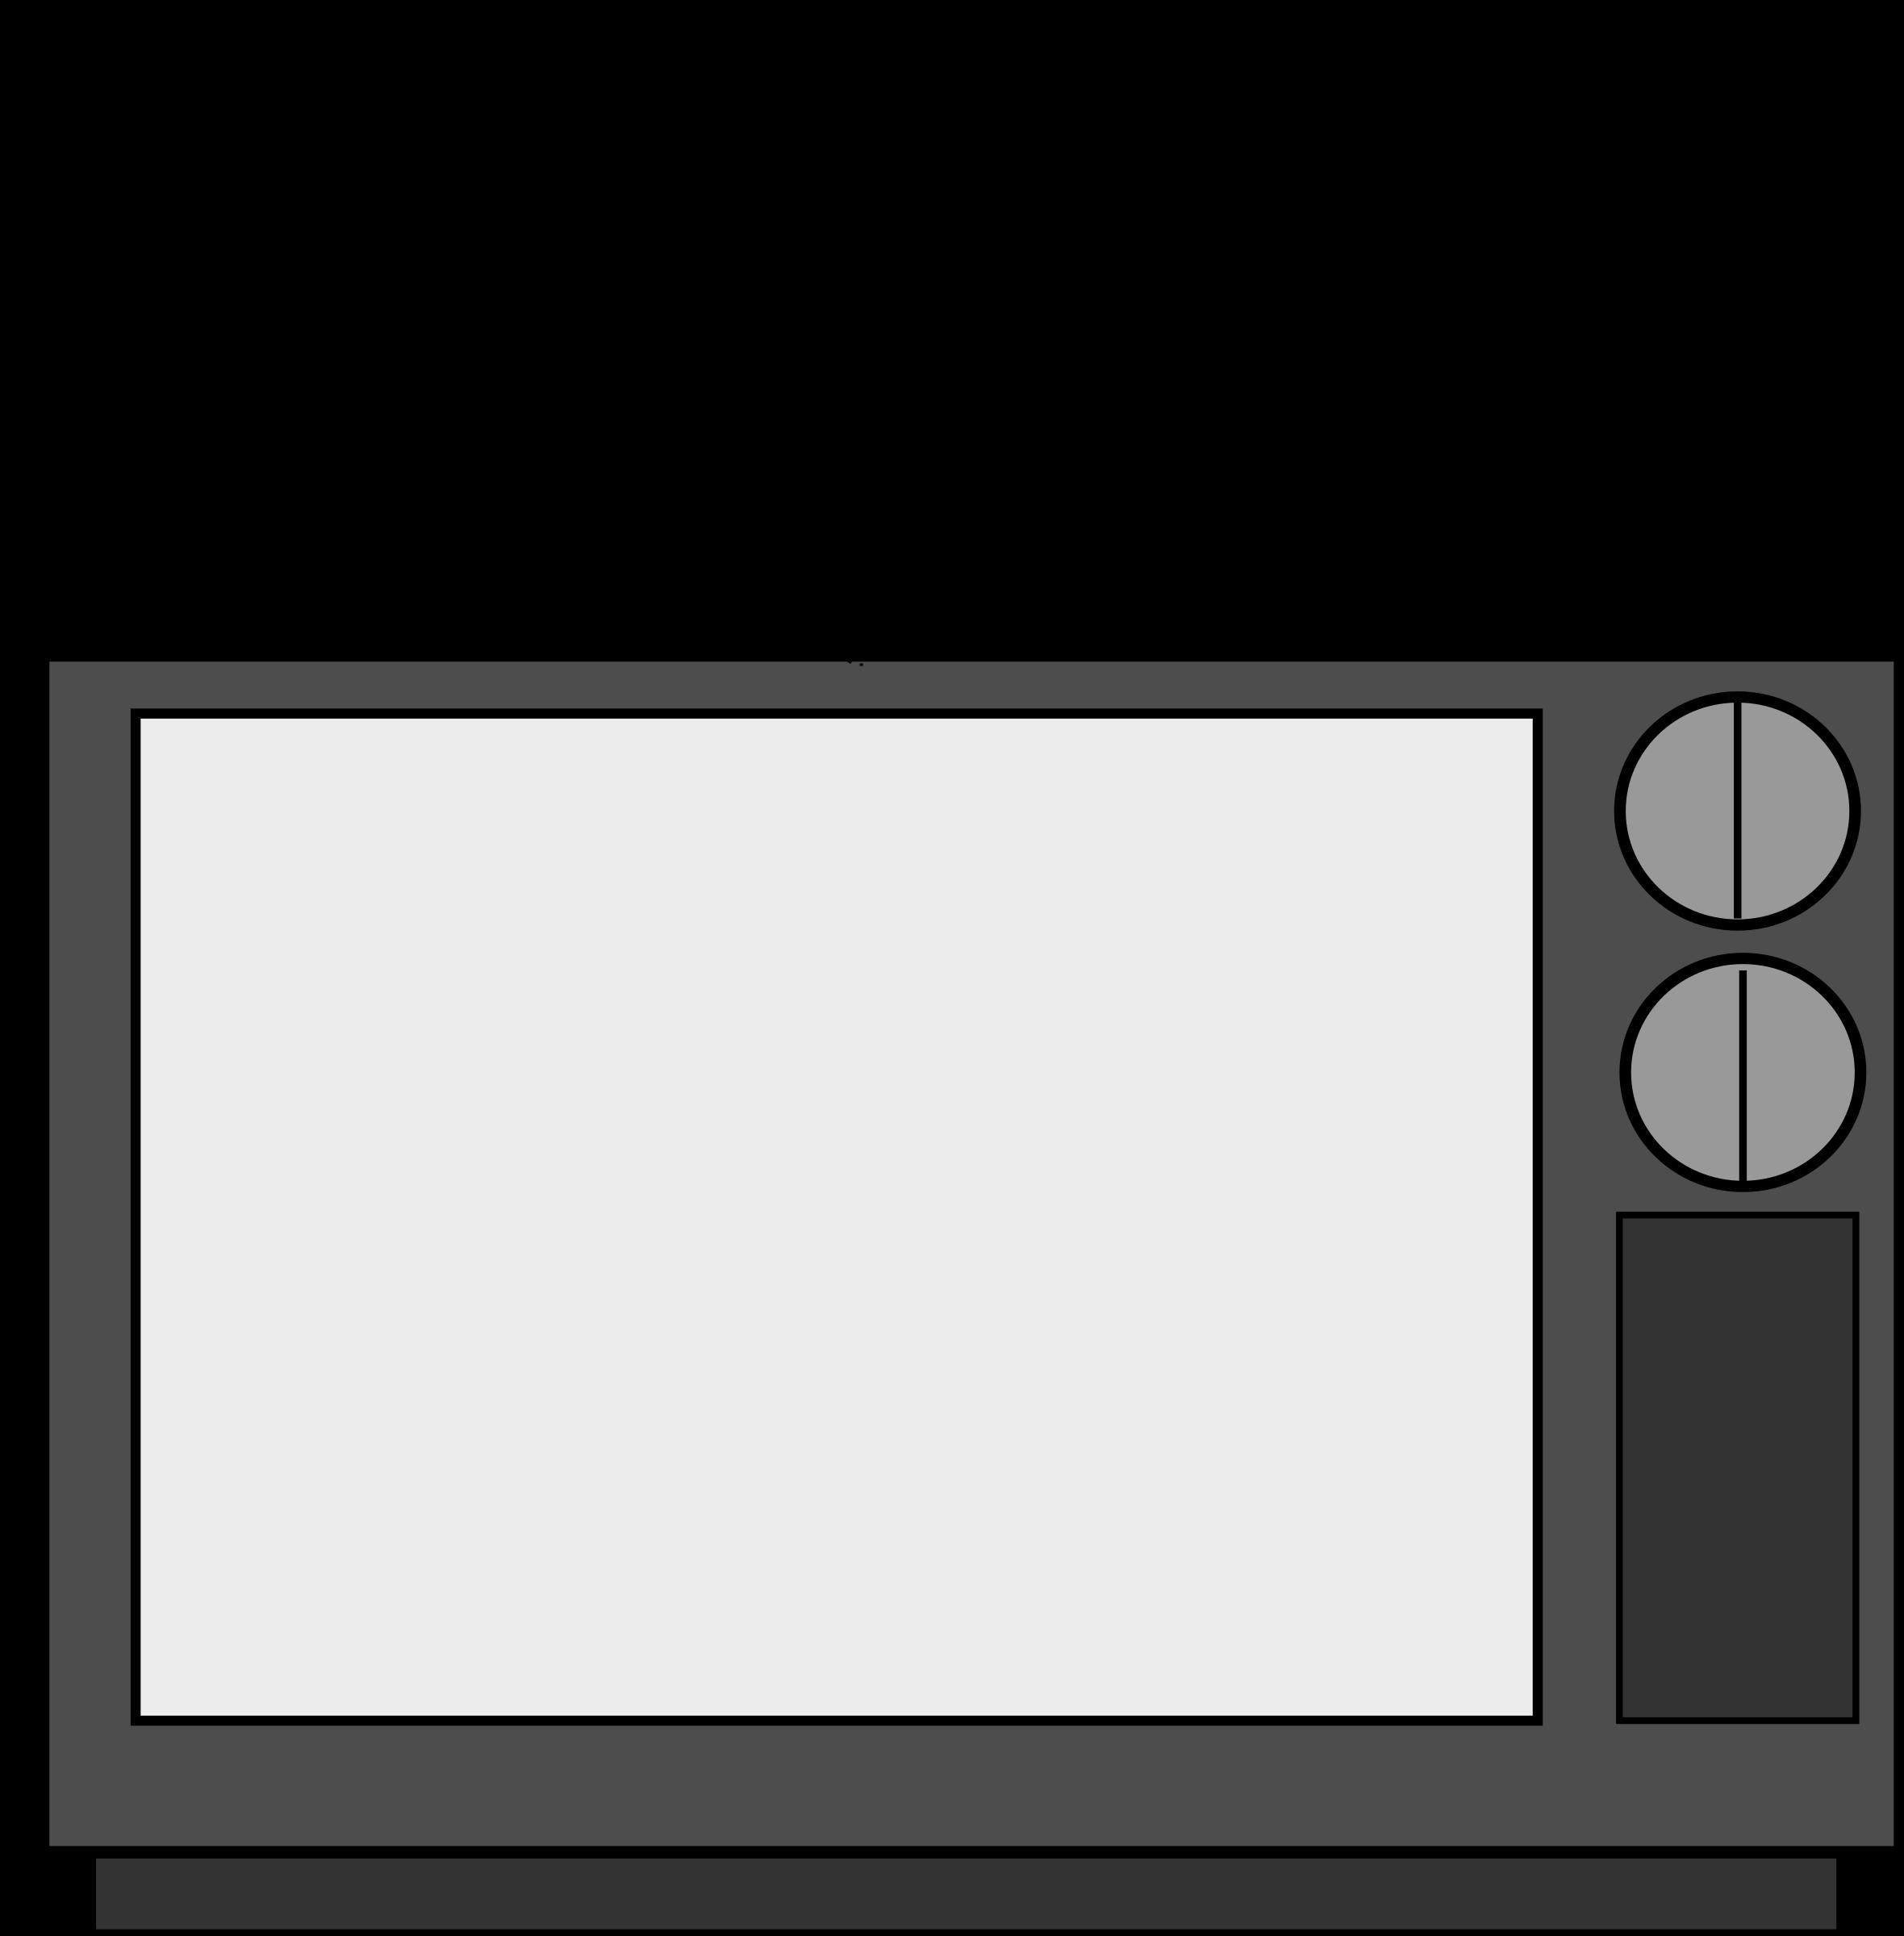 Blank Tv Clipart.